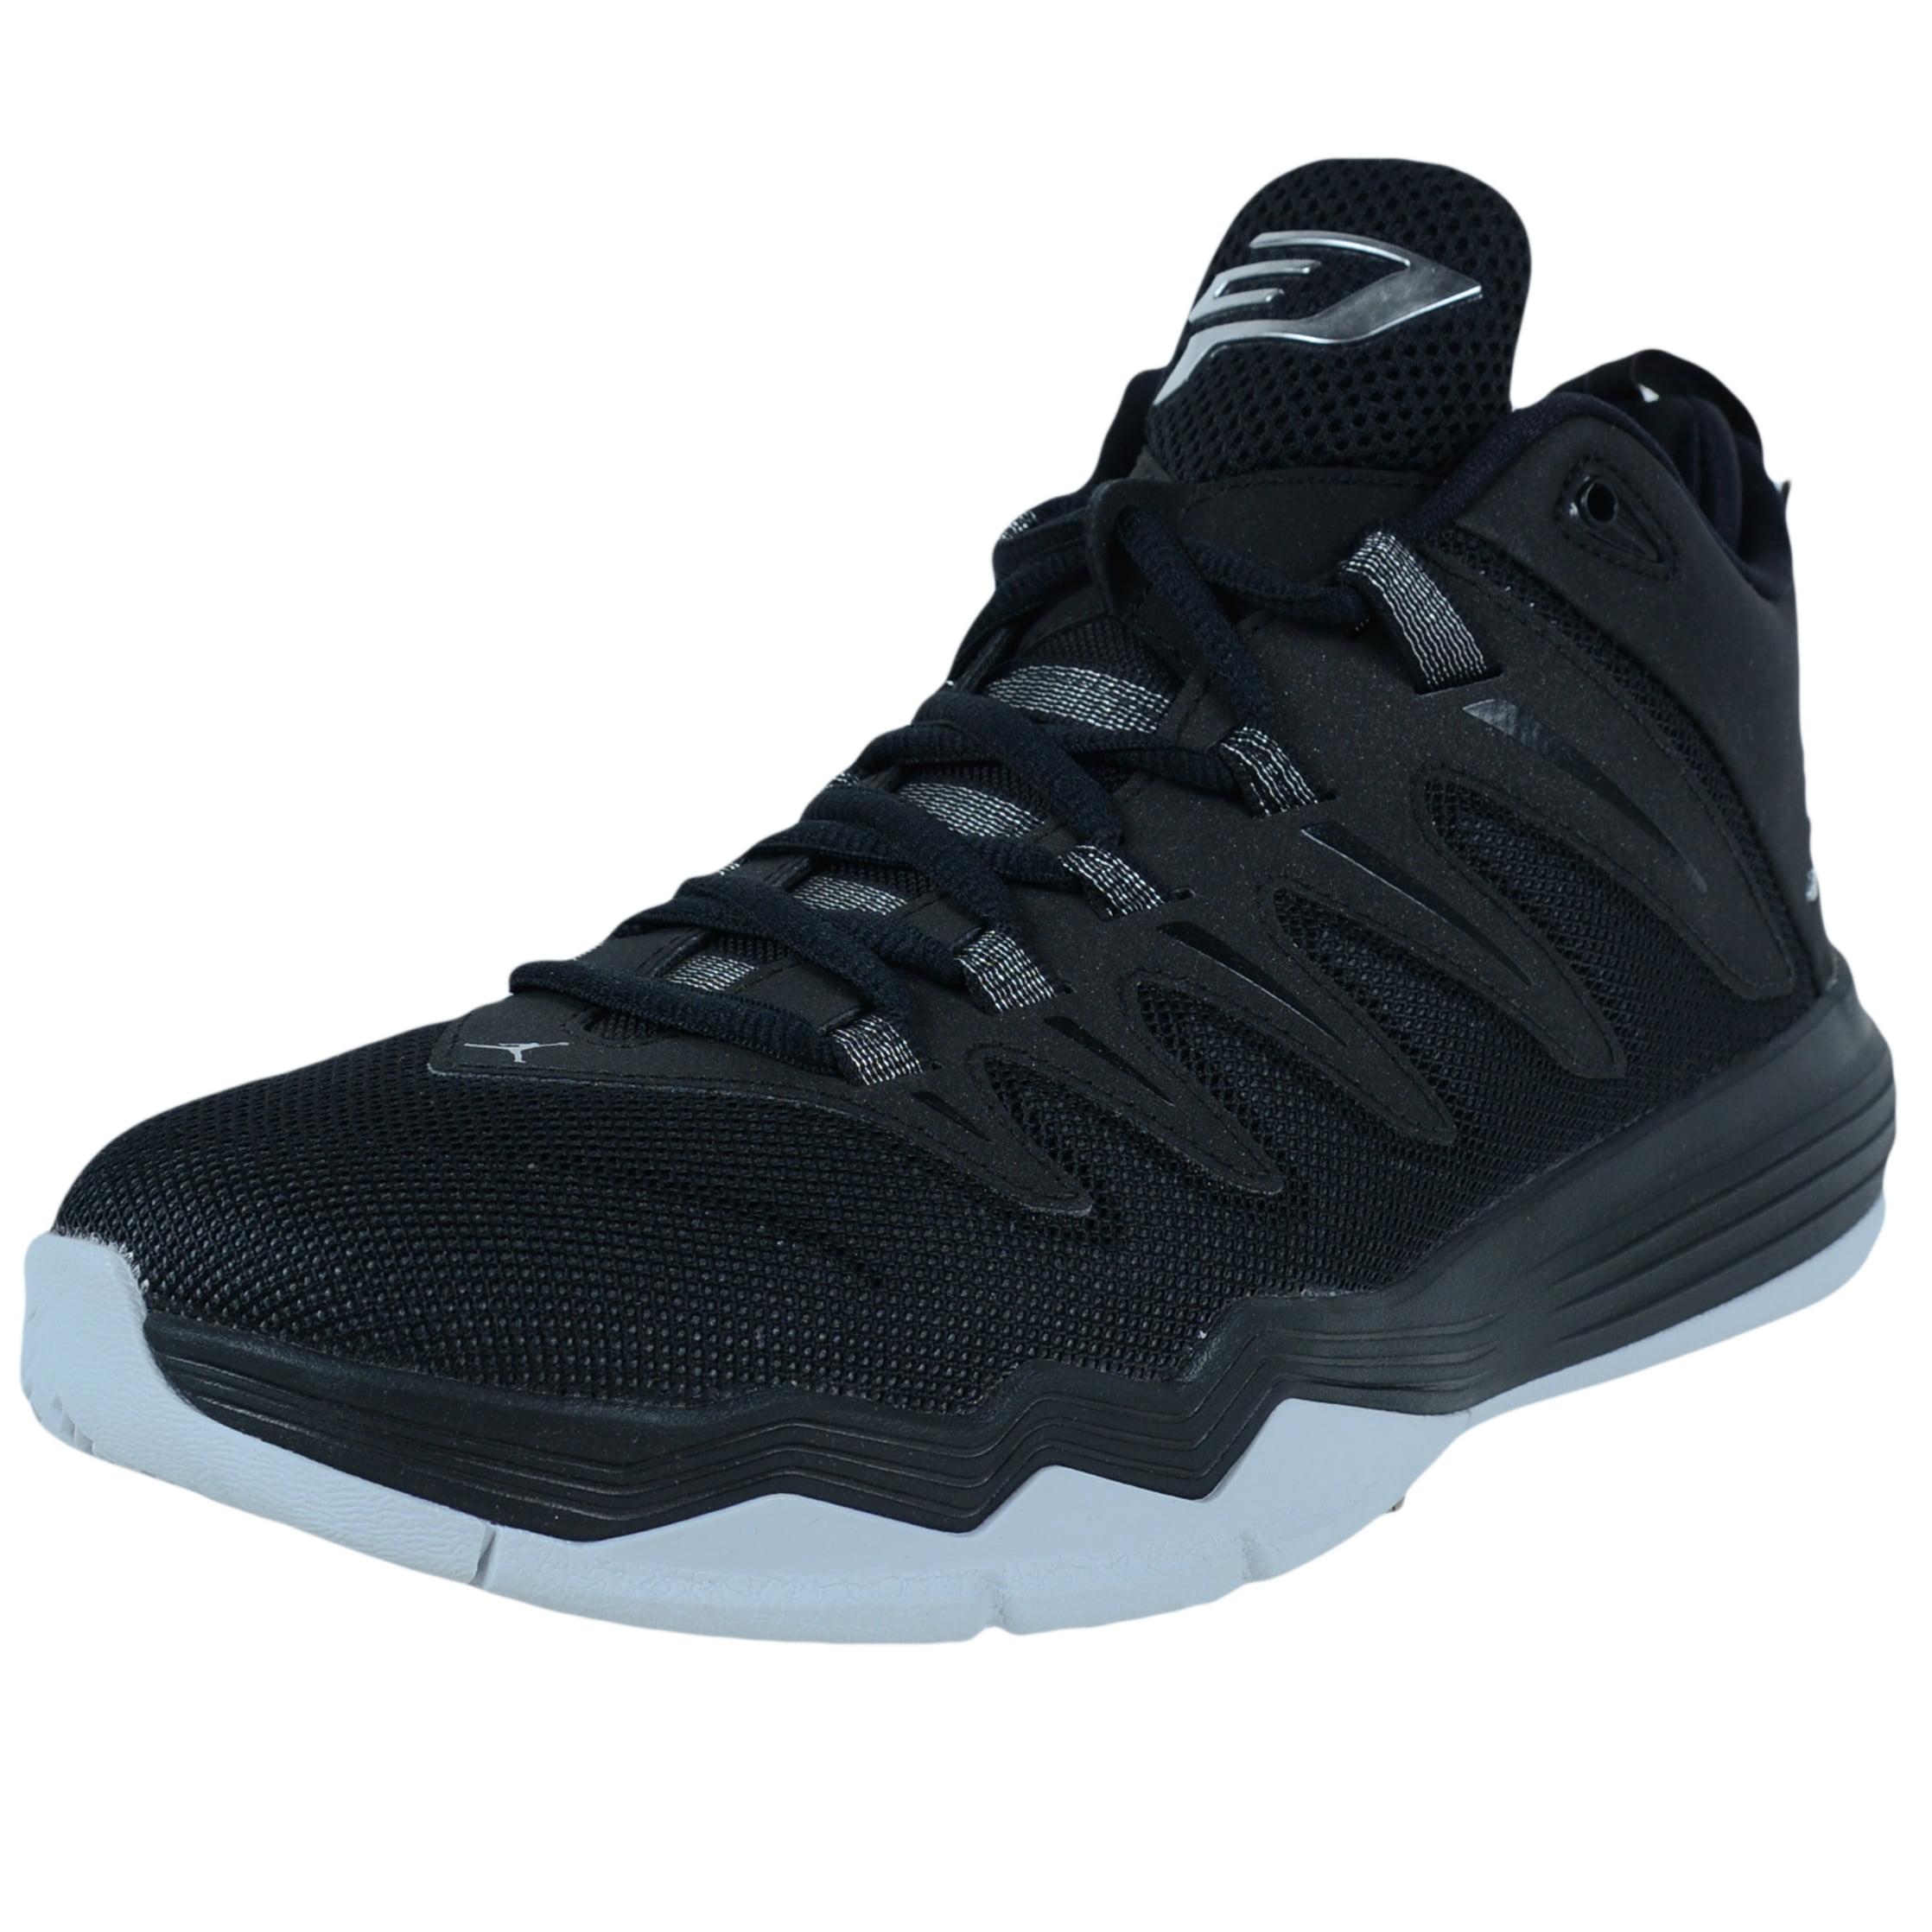 Nike JORDAN CP3.IX BASKETBALL SHOES BLACK METALLIC SILVER...